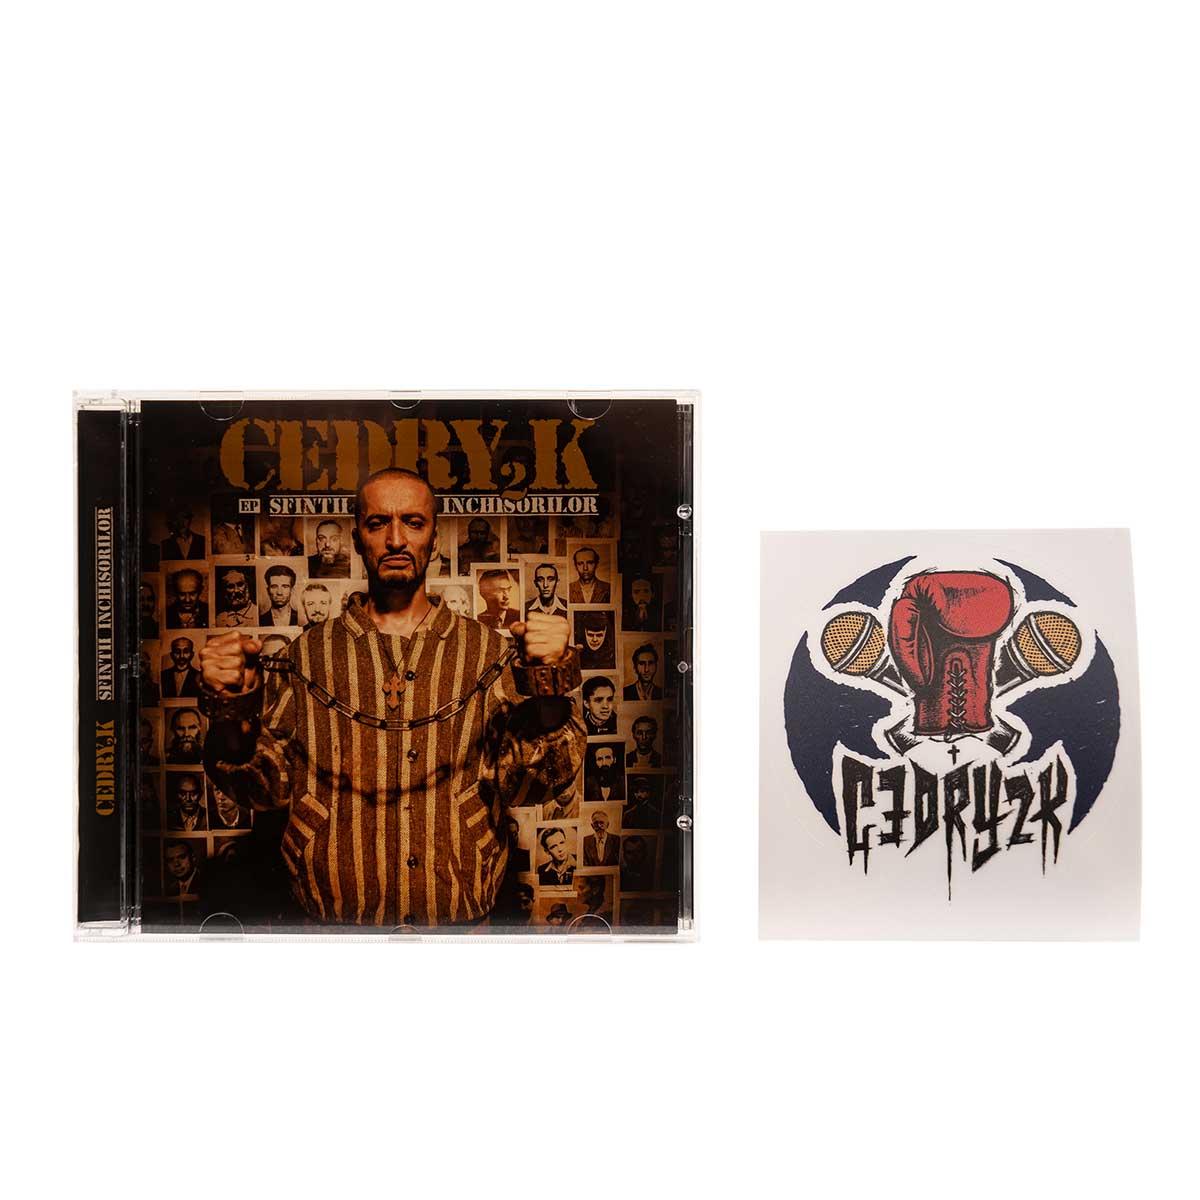 Cedry2k_SfintiiInchisorilor_CD+sticker